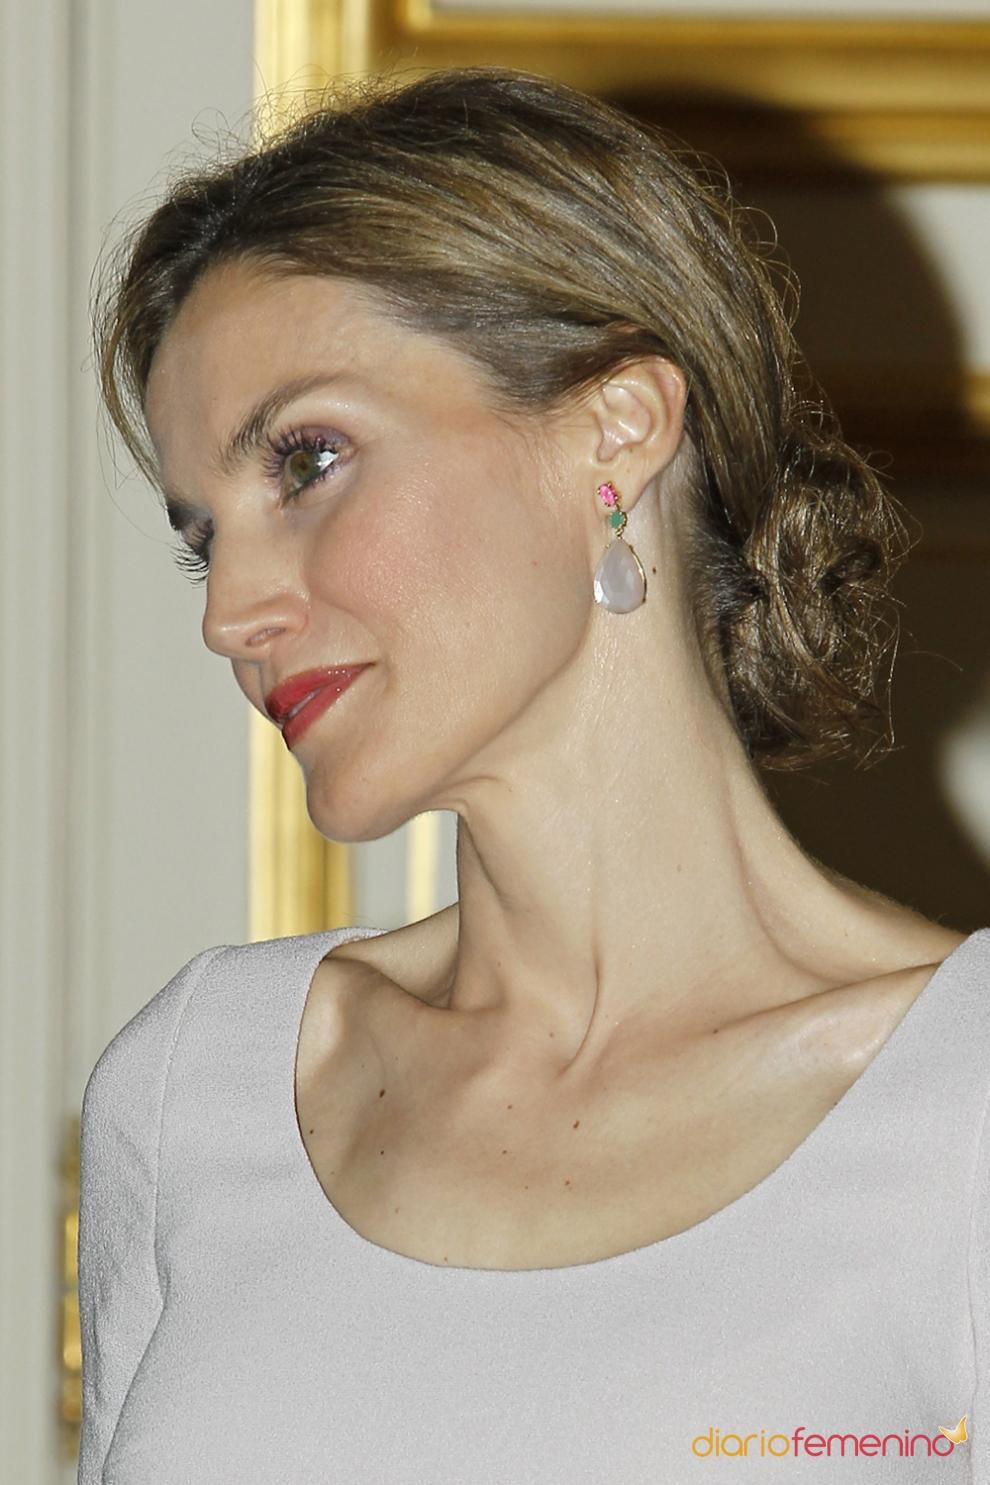 Más cautivador reina letizia peinados Imagen de cortes de pelo Ideas - Peinados reina Letizia: un moño muy sofisticado